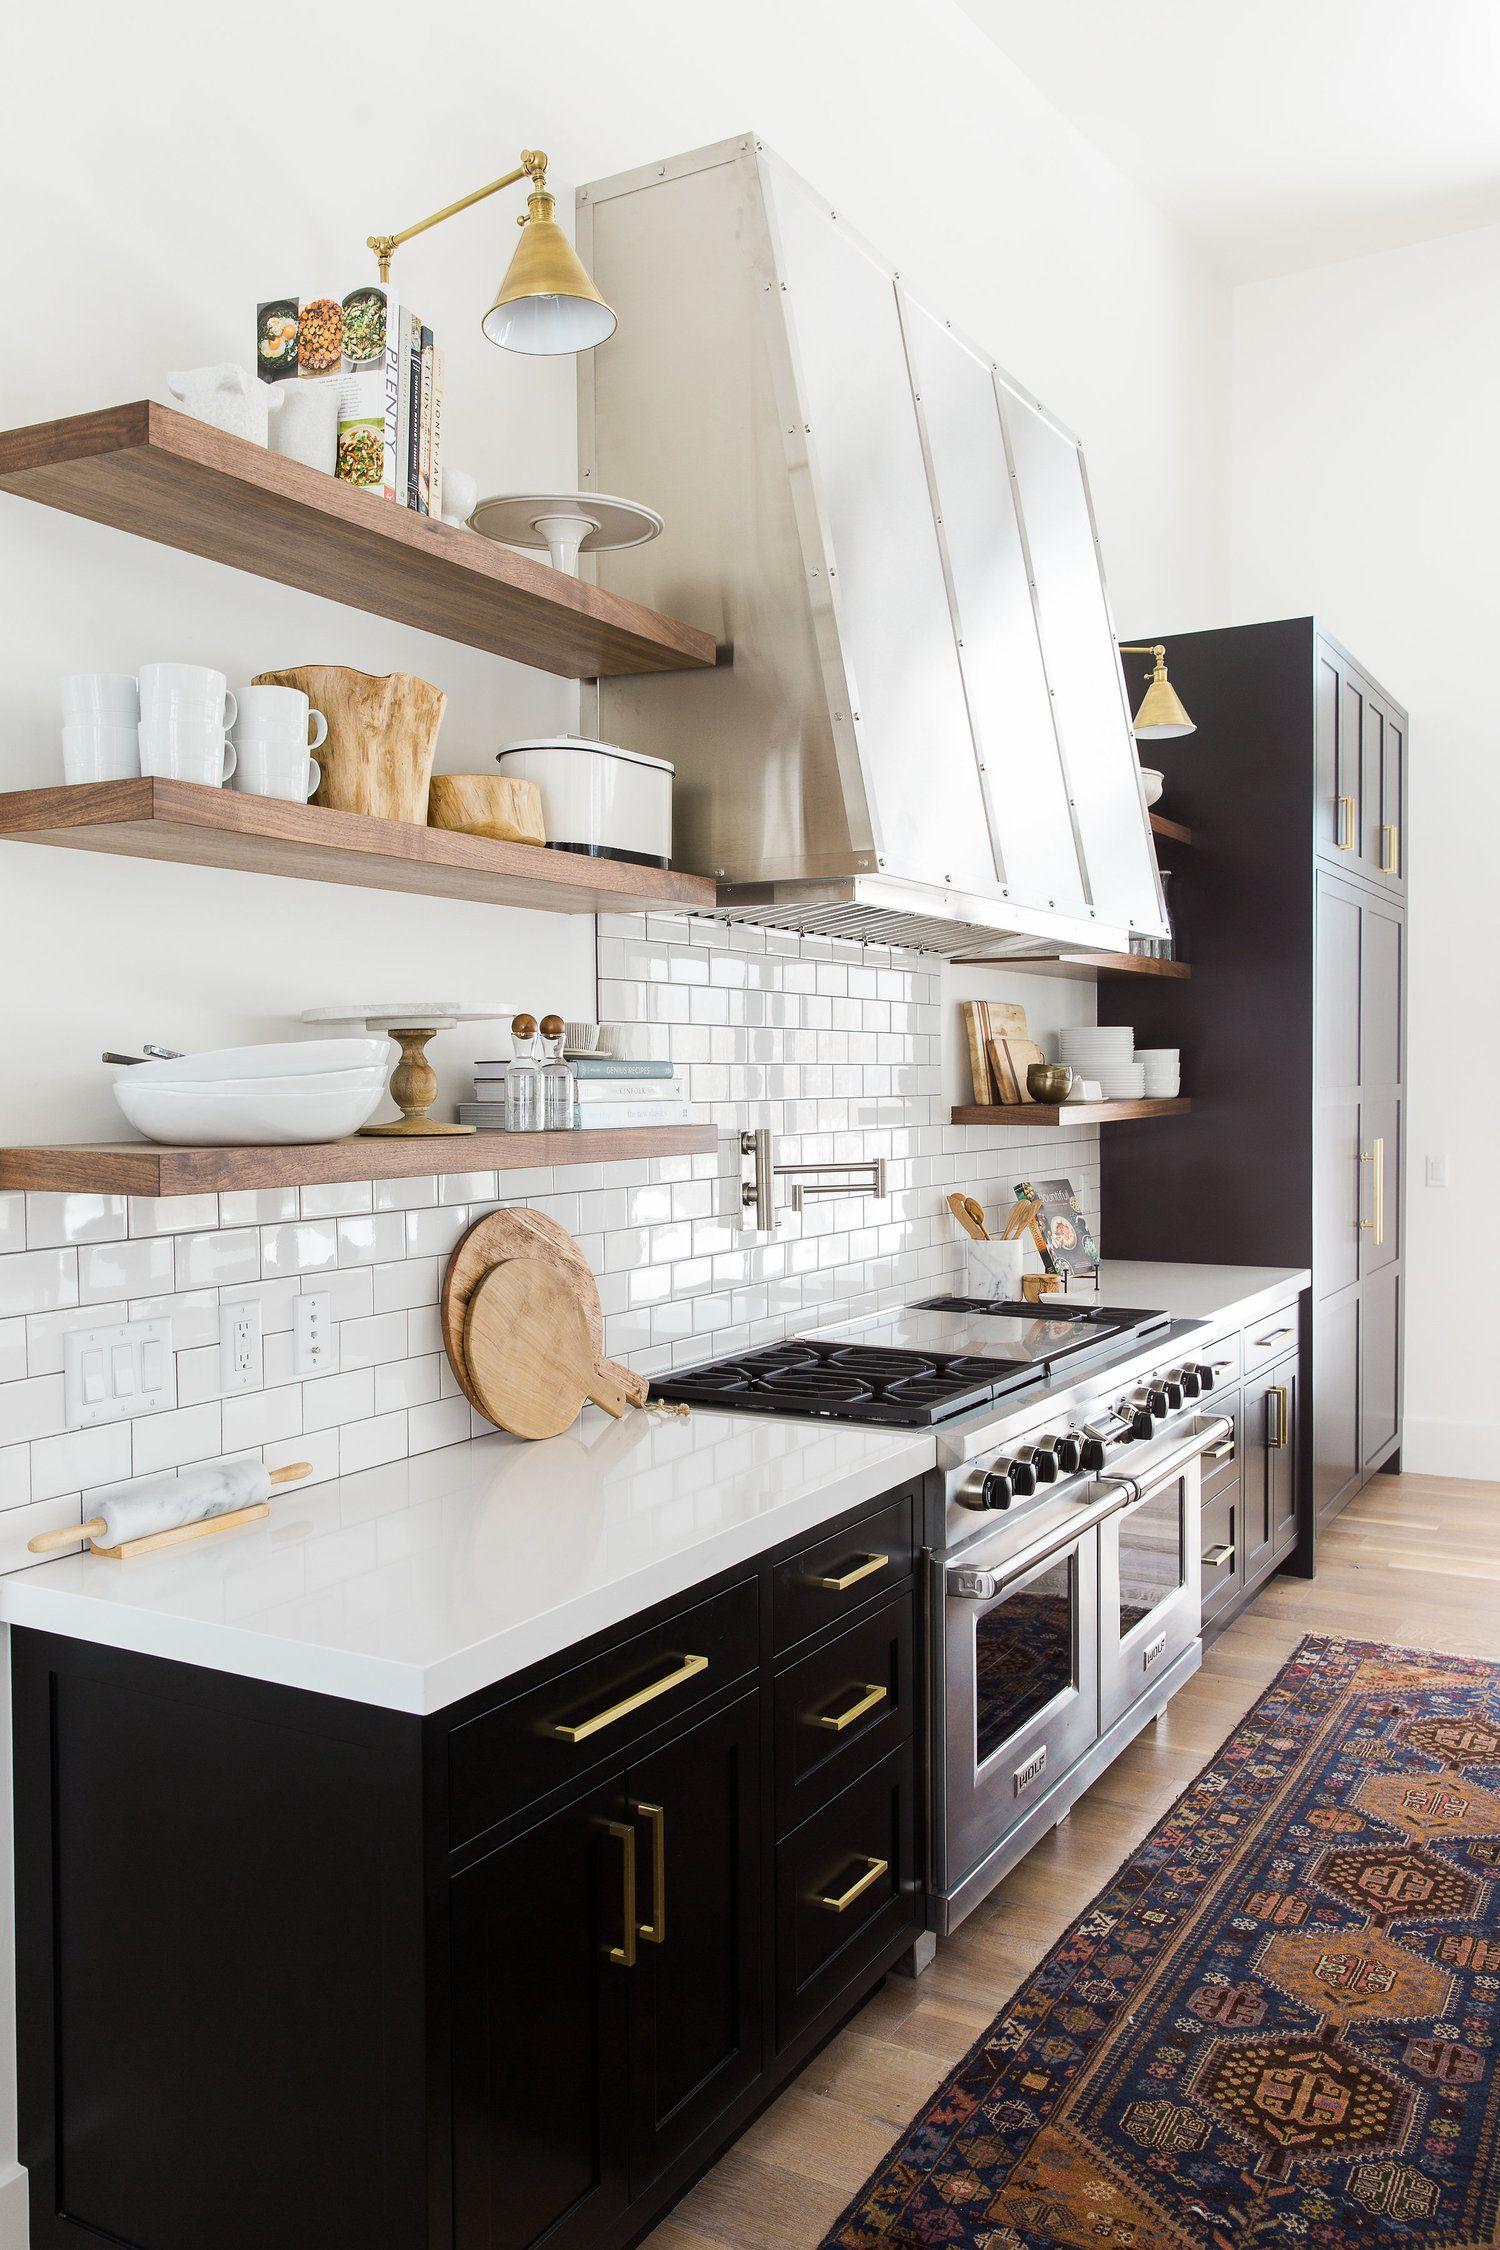 Küchenideen aus kupfer modern mountain home tour great room kitchen dining  kuba